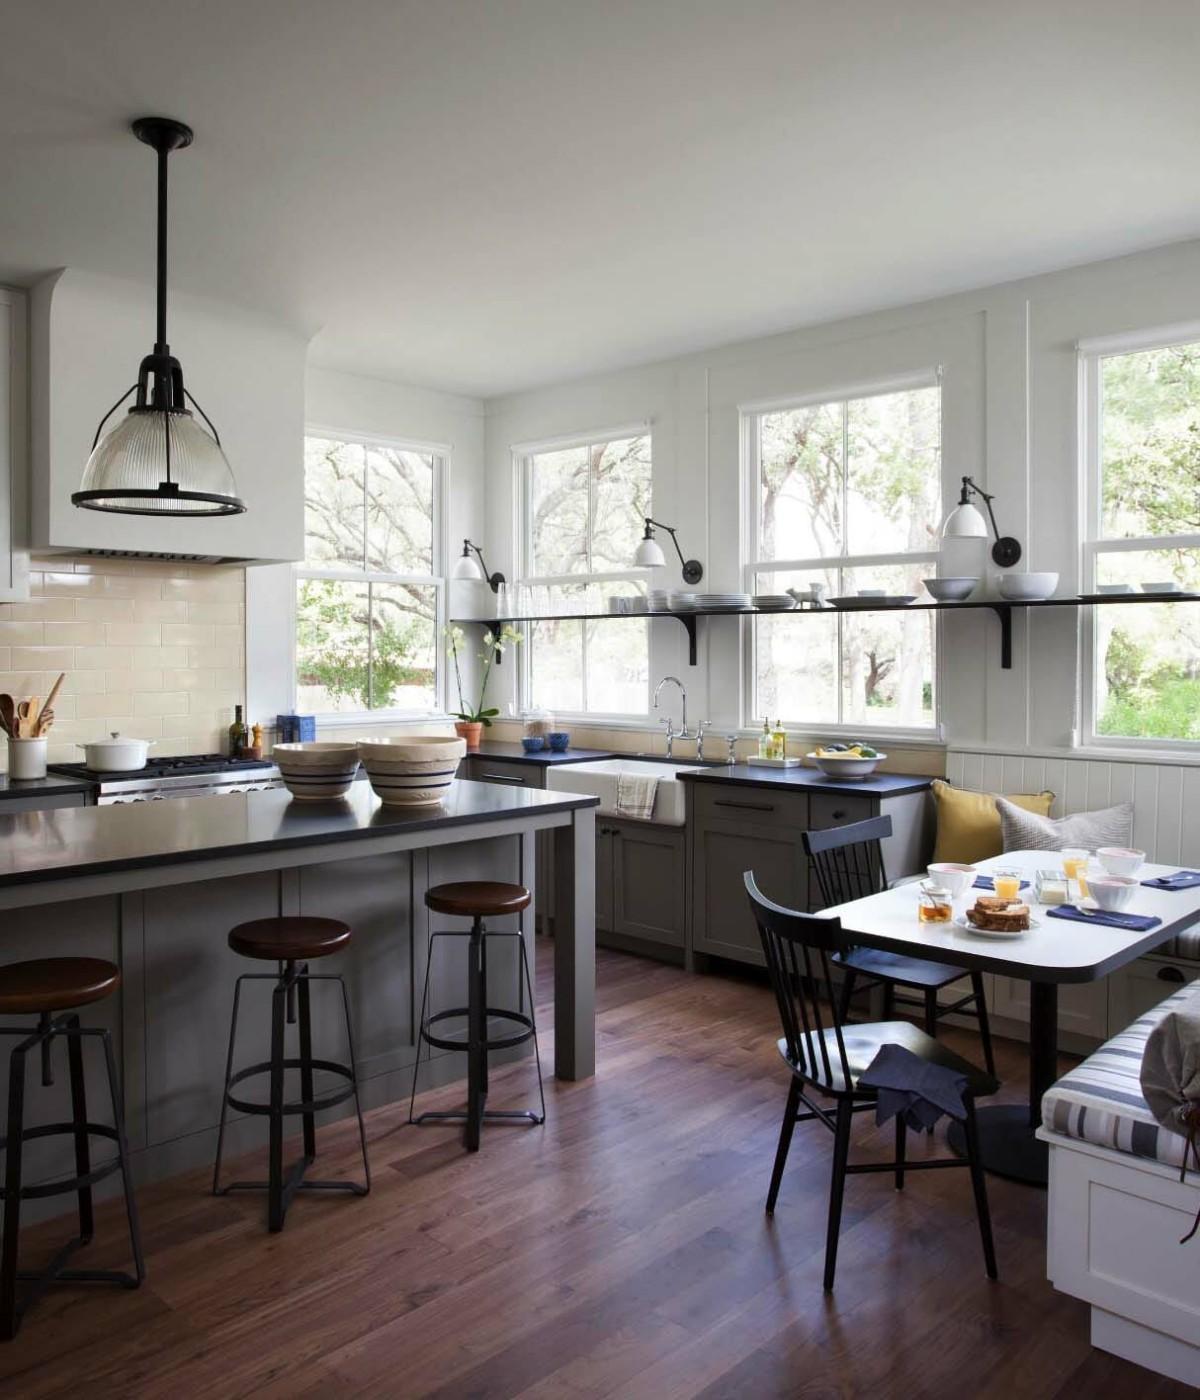 кухня в серых тонах с ярким тёмно-синими акцентами